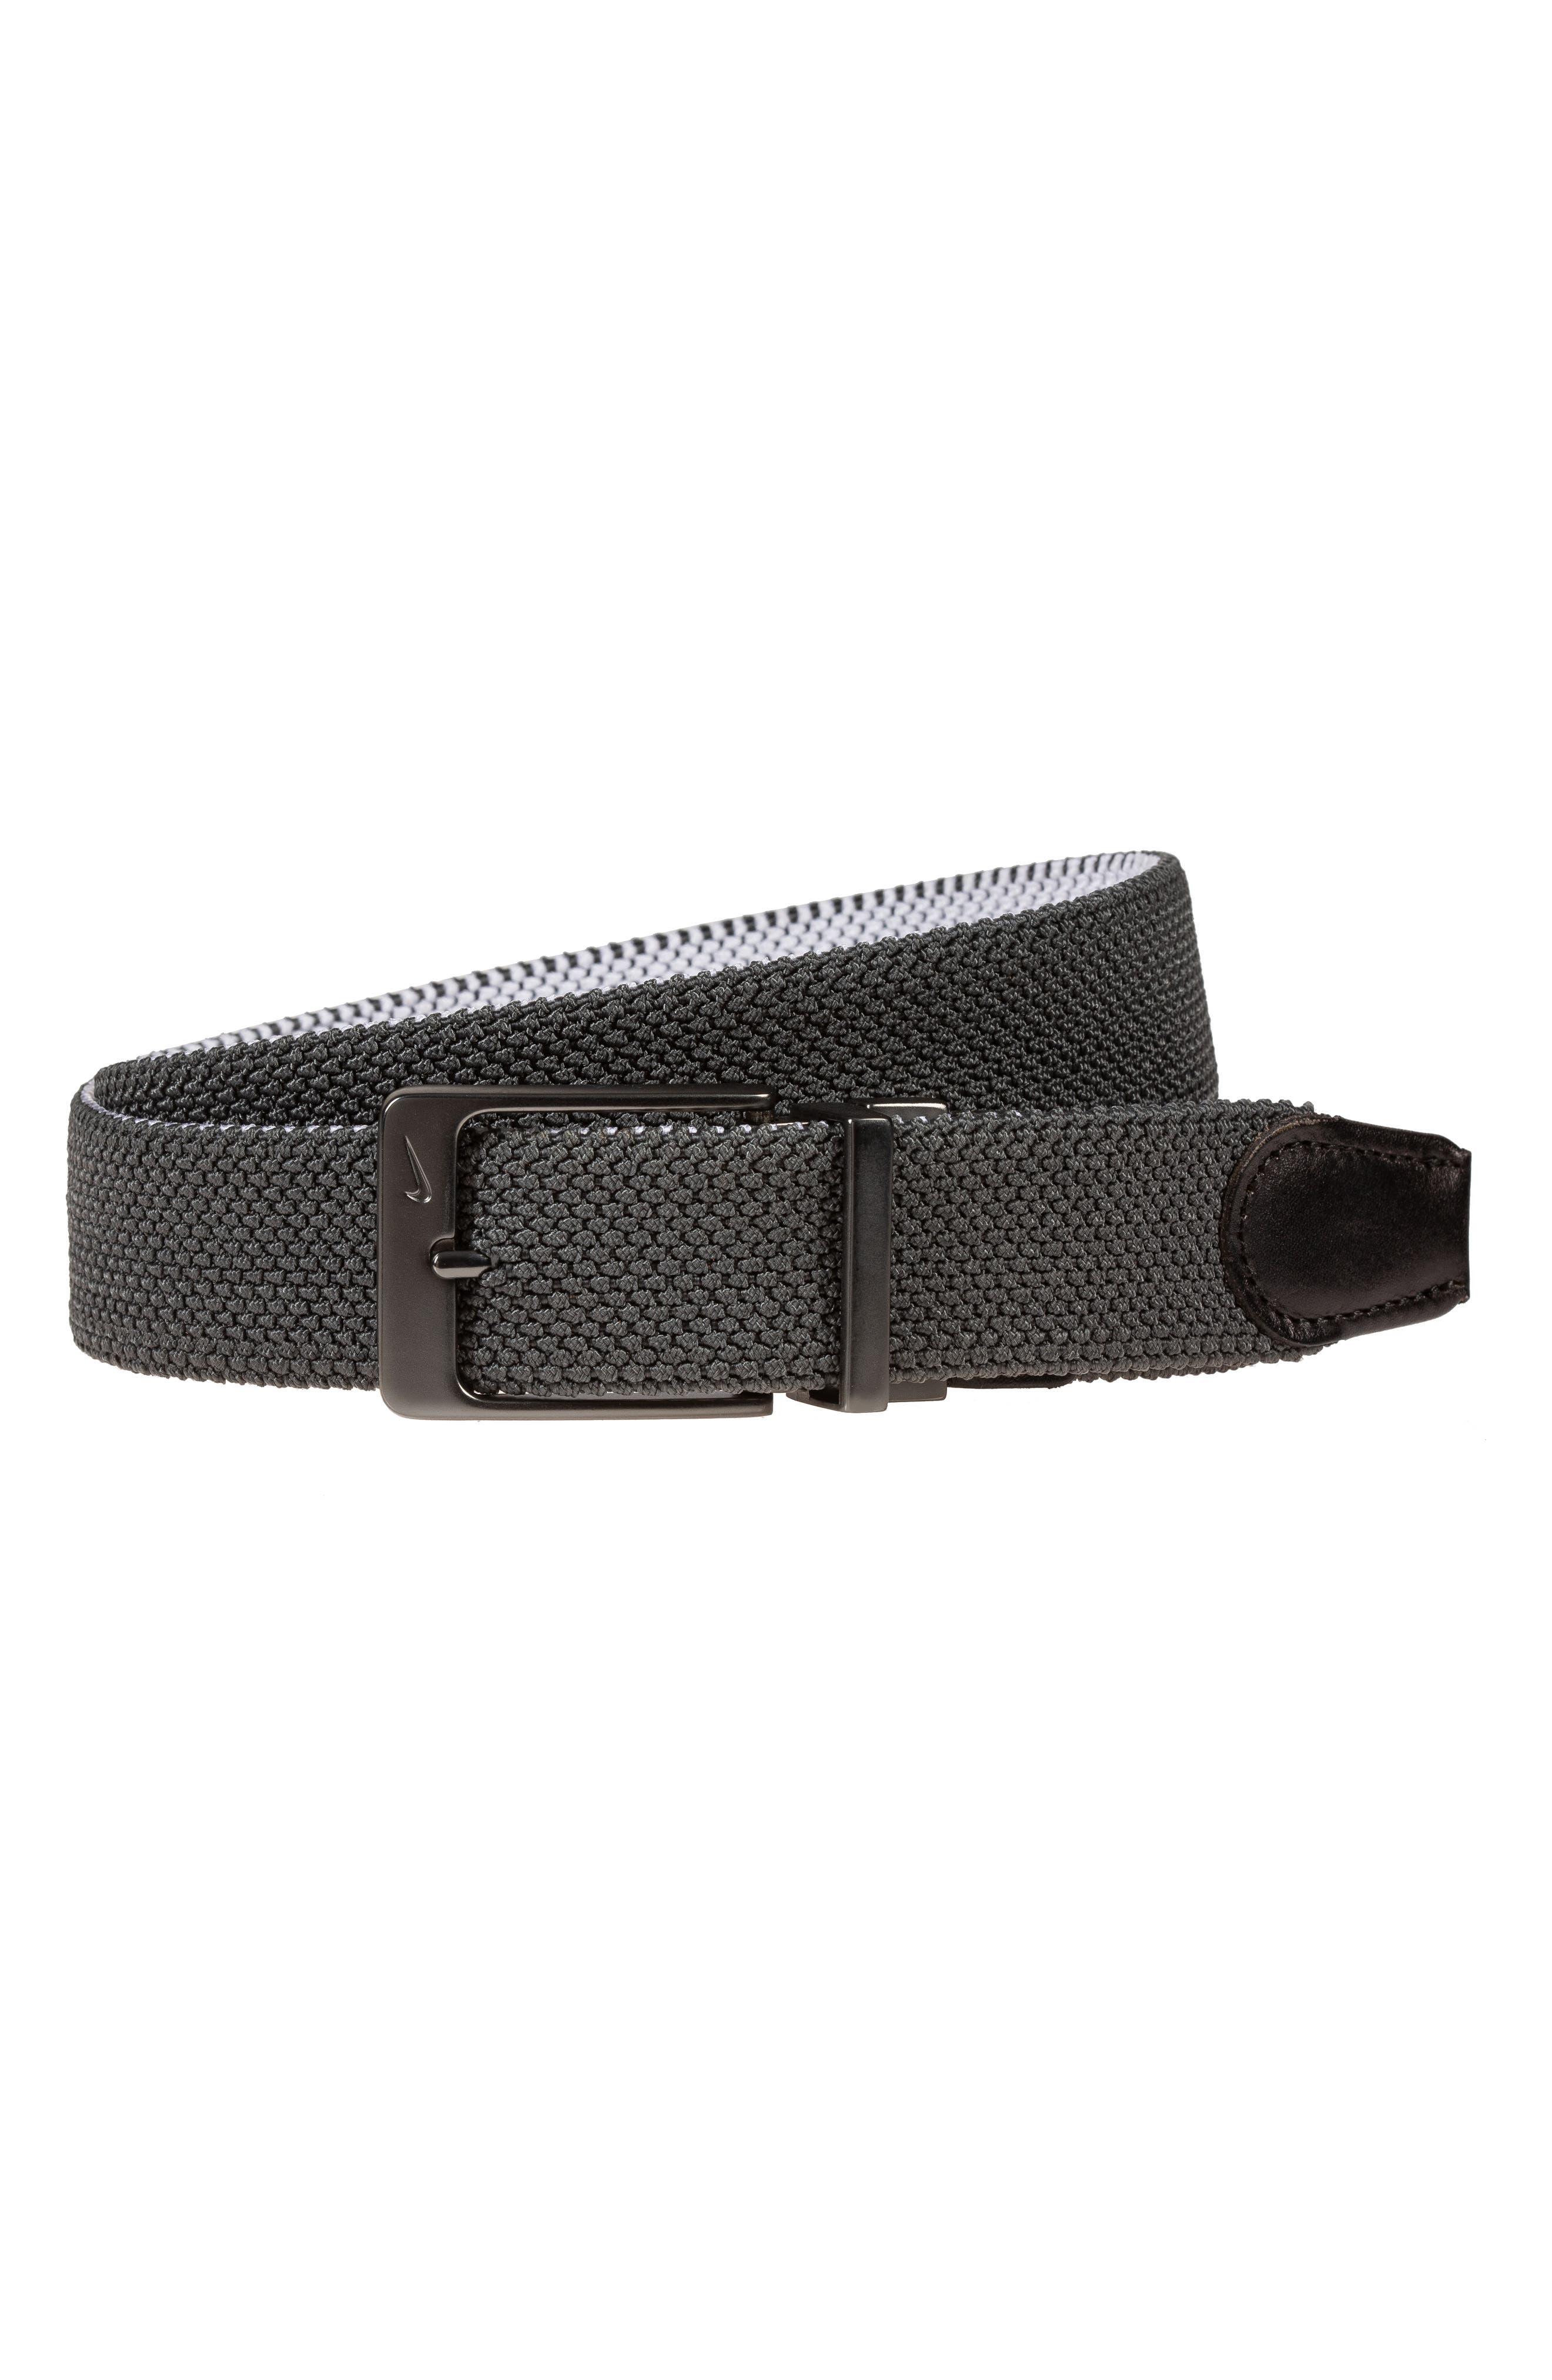 Nike Reversible G-Flex Woven Belt, Dark Grey